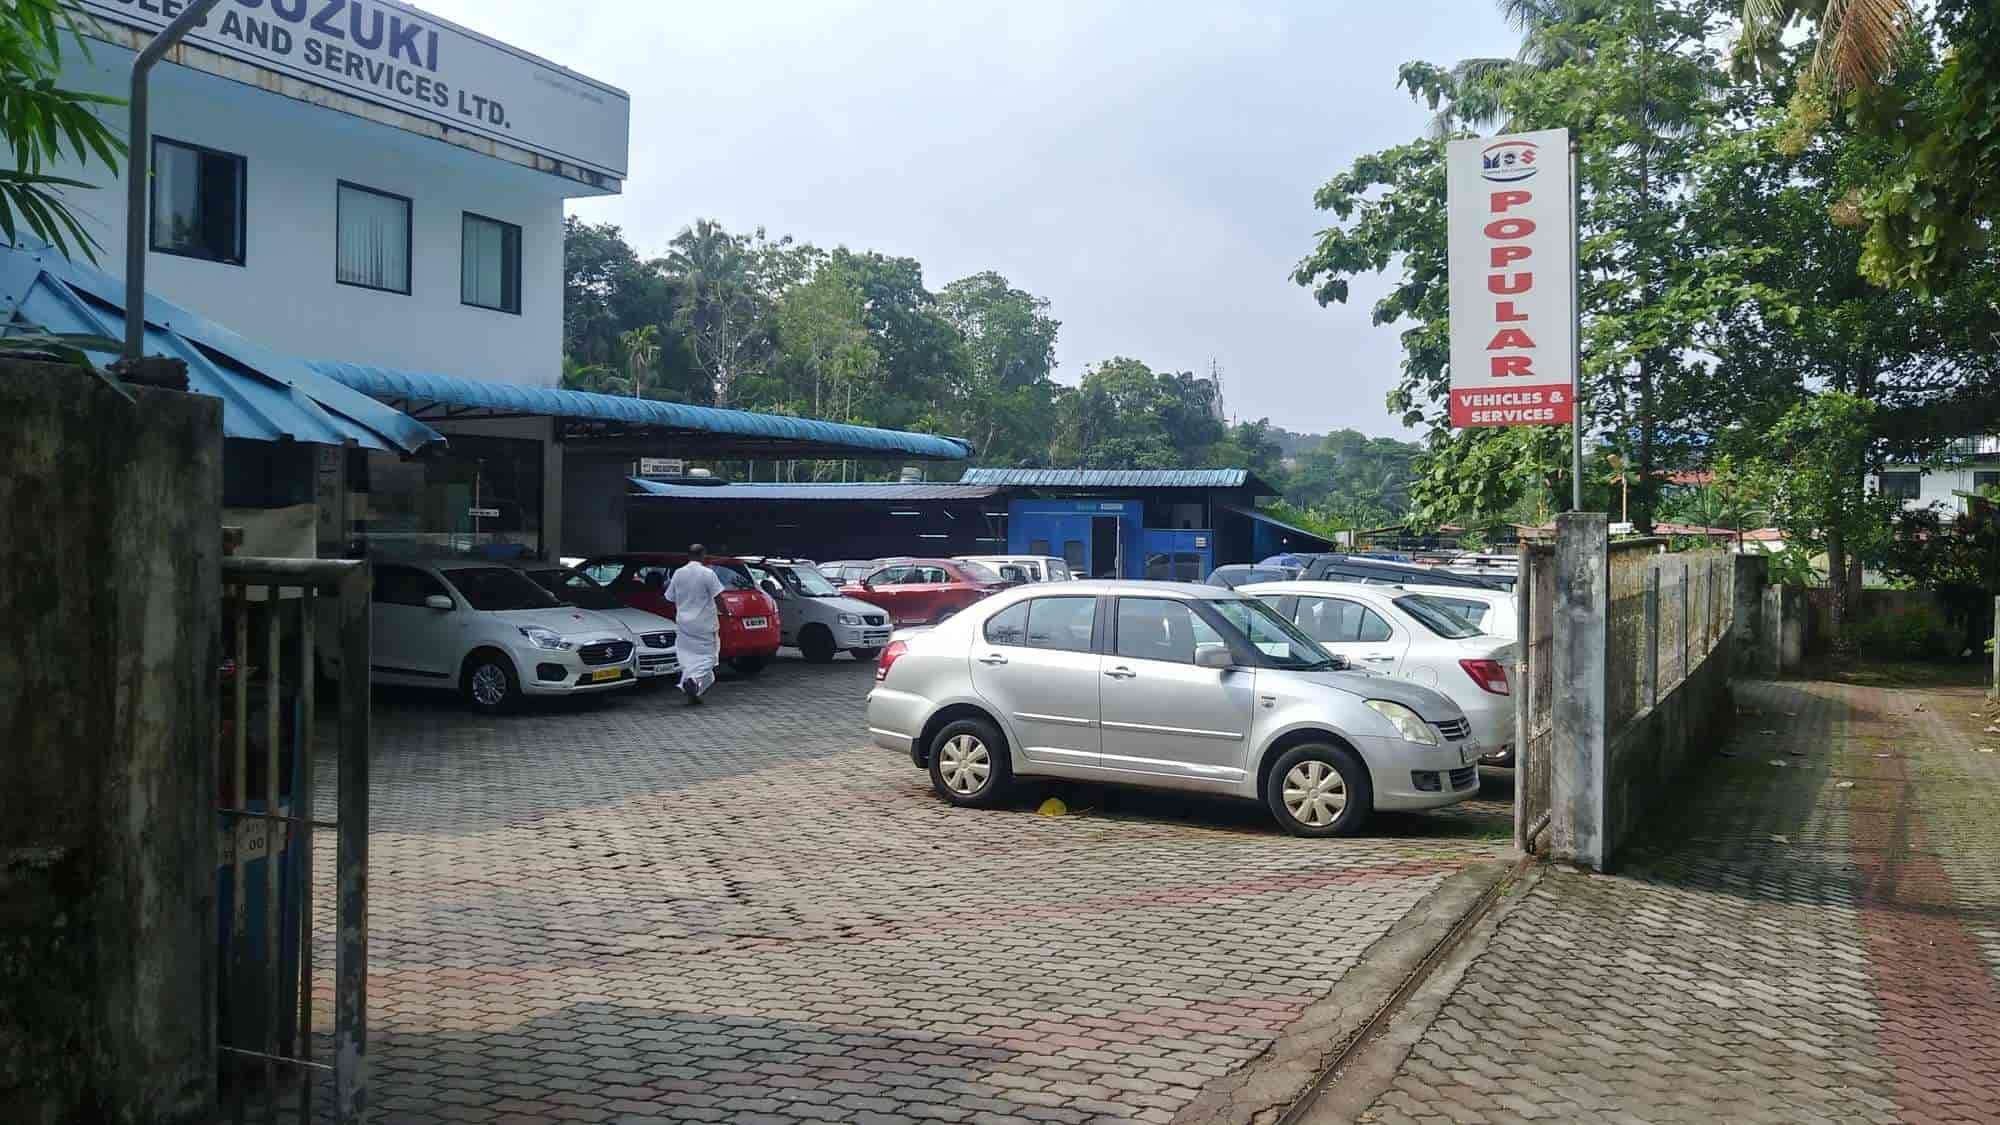 Suzuki Car Dealership >> Top 10 Maruti Suzuki Car Dealers In Pathanamthitta Best Maruti